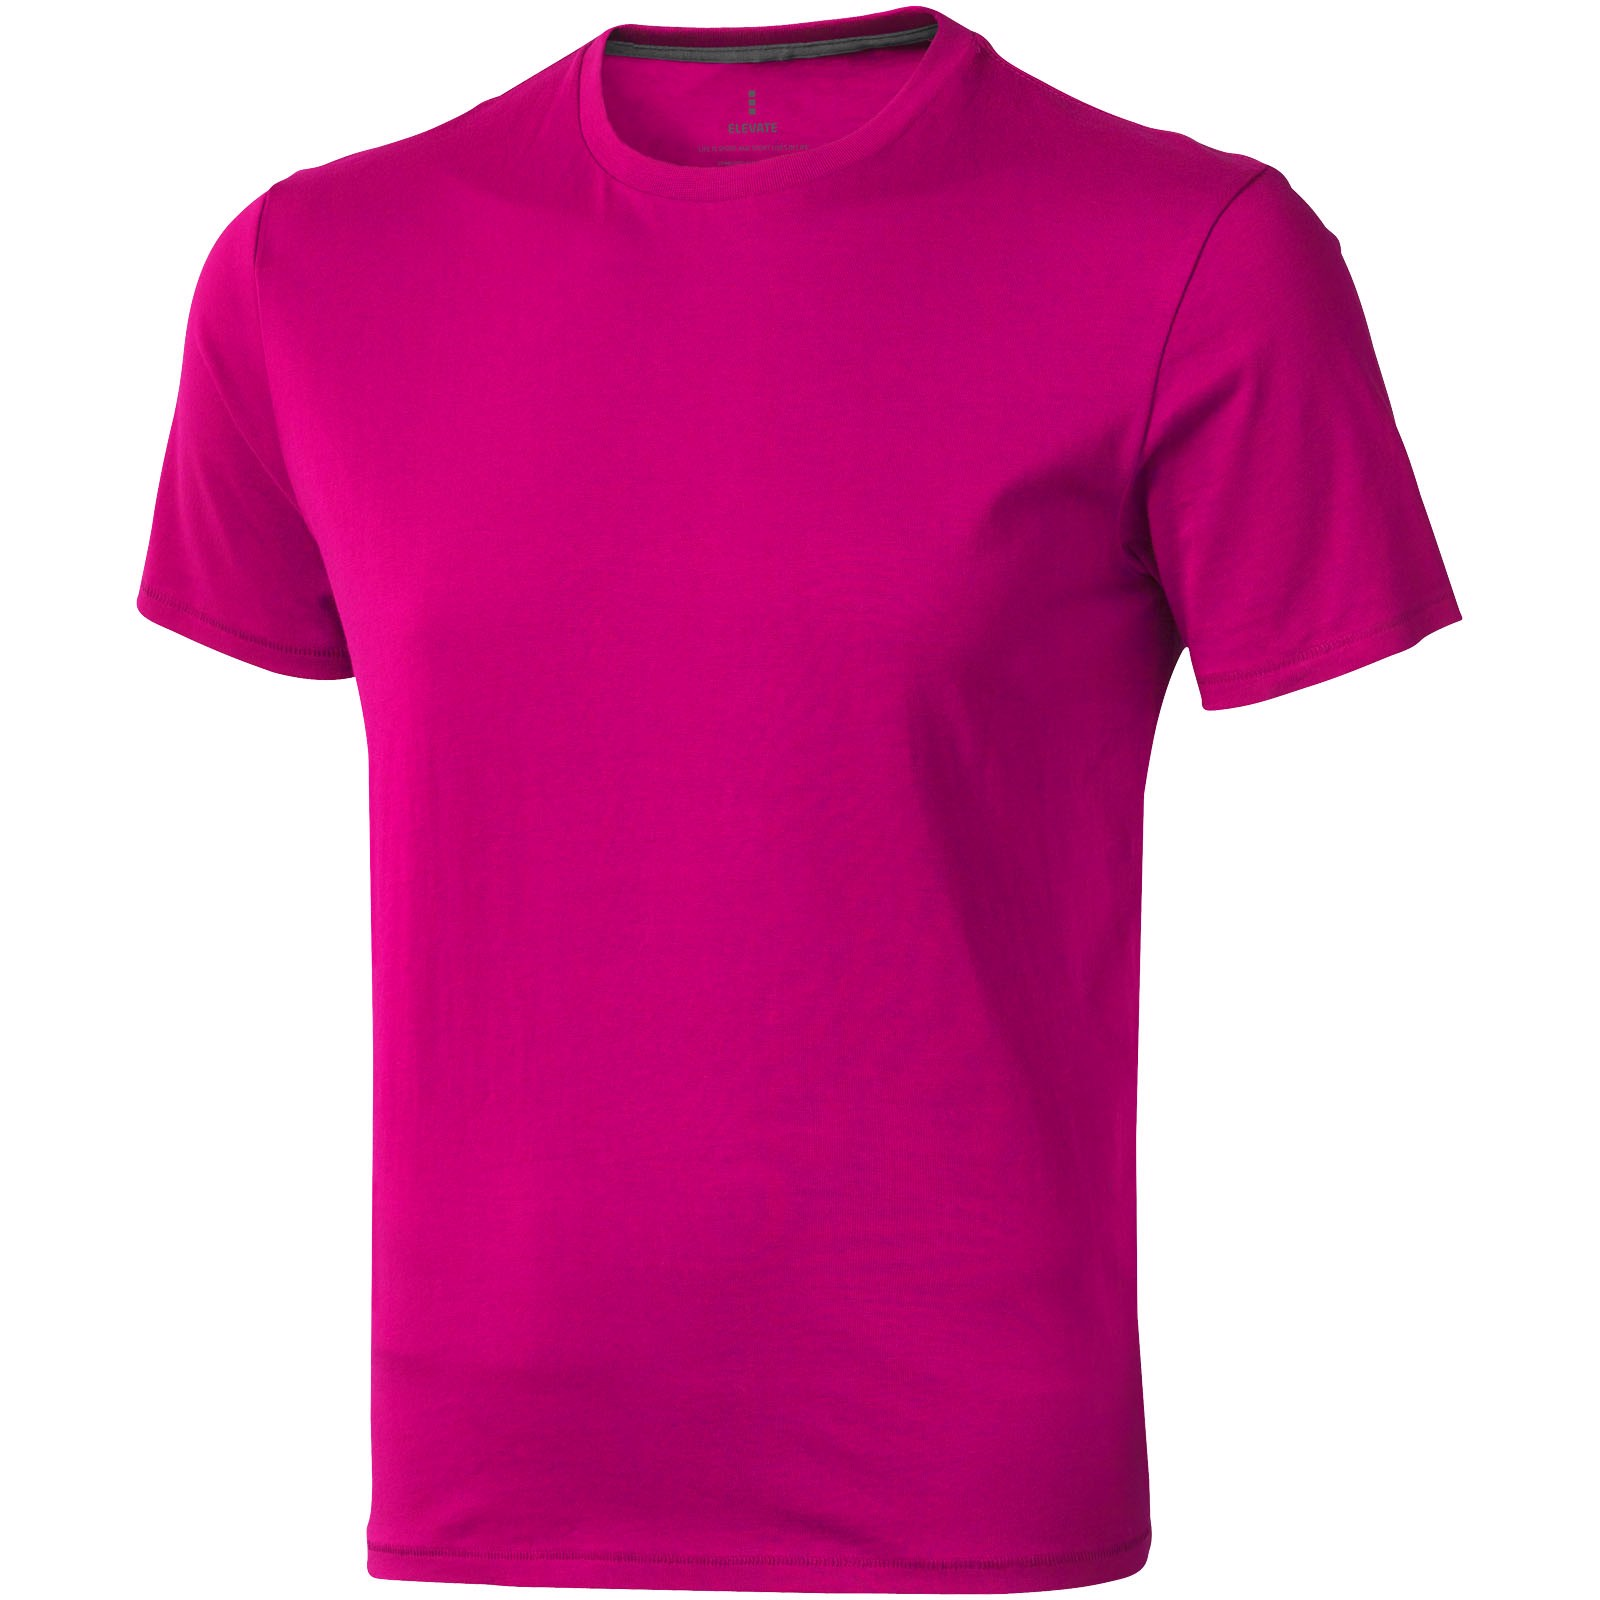 Nanaimo short sleeve men's t-shirt - Magenta / XXL